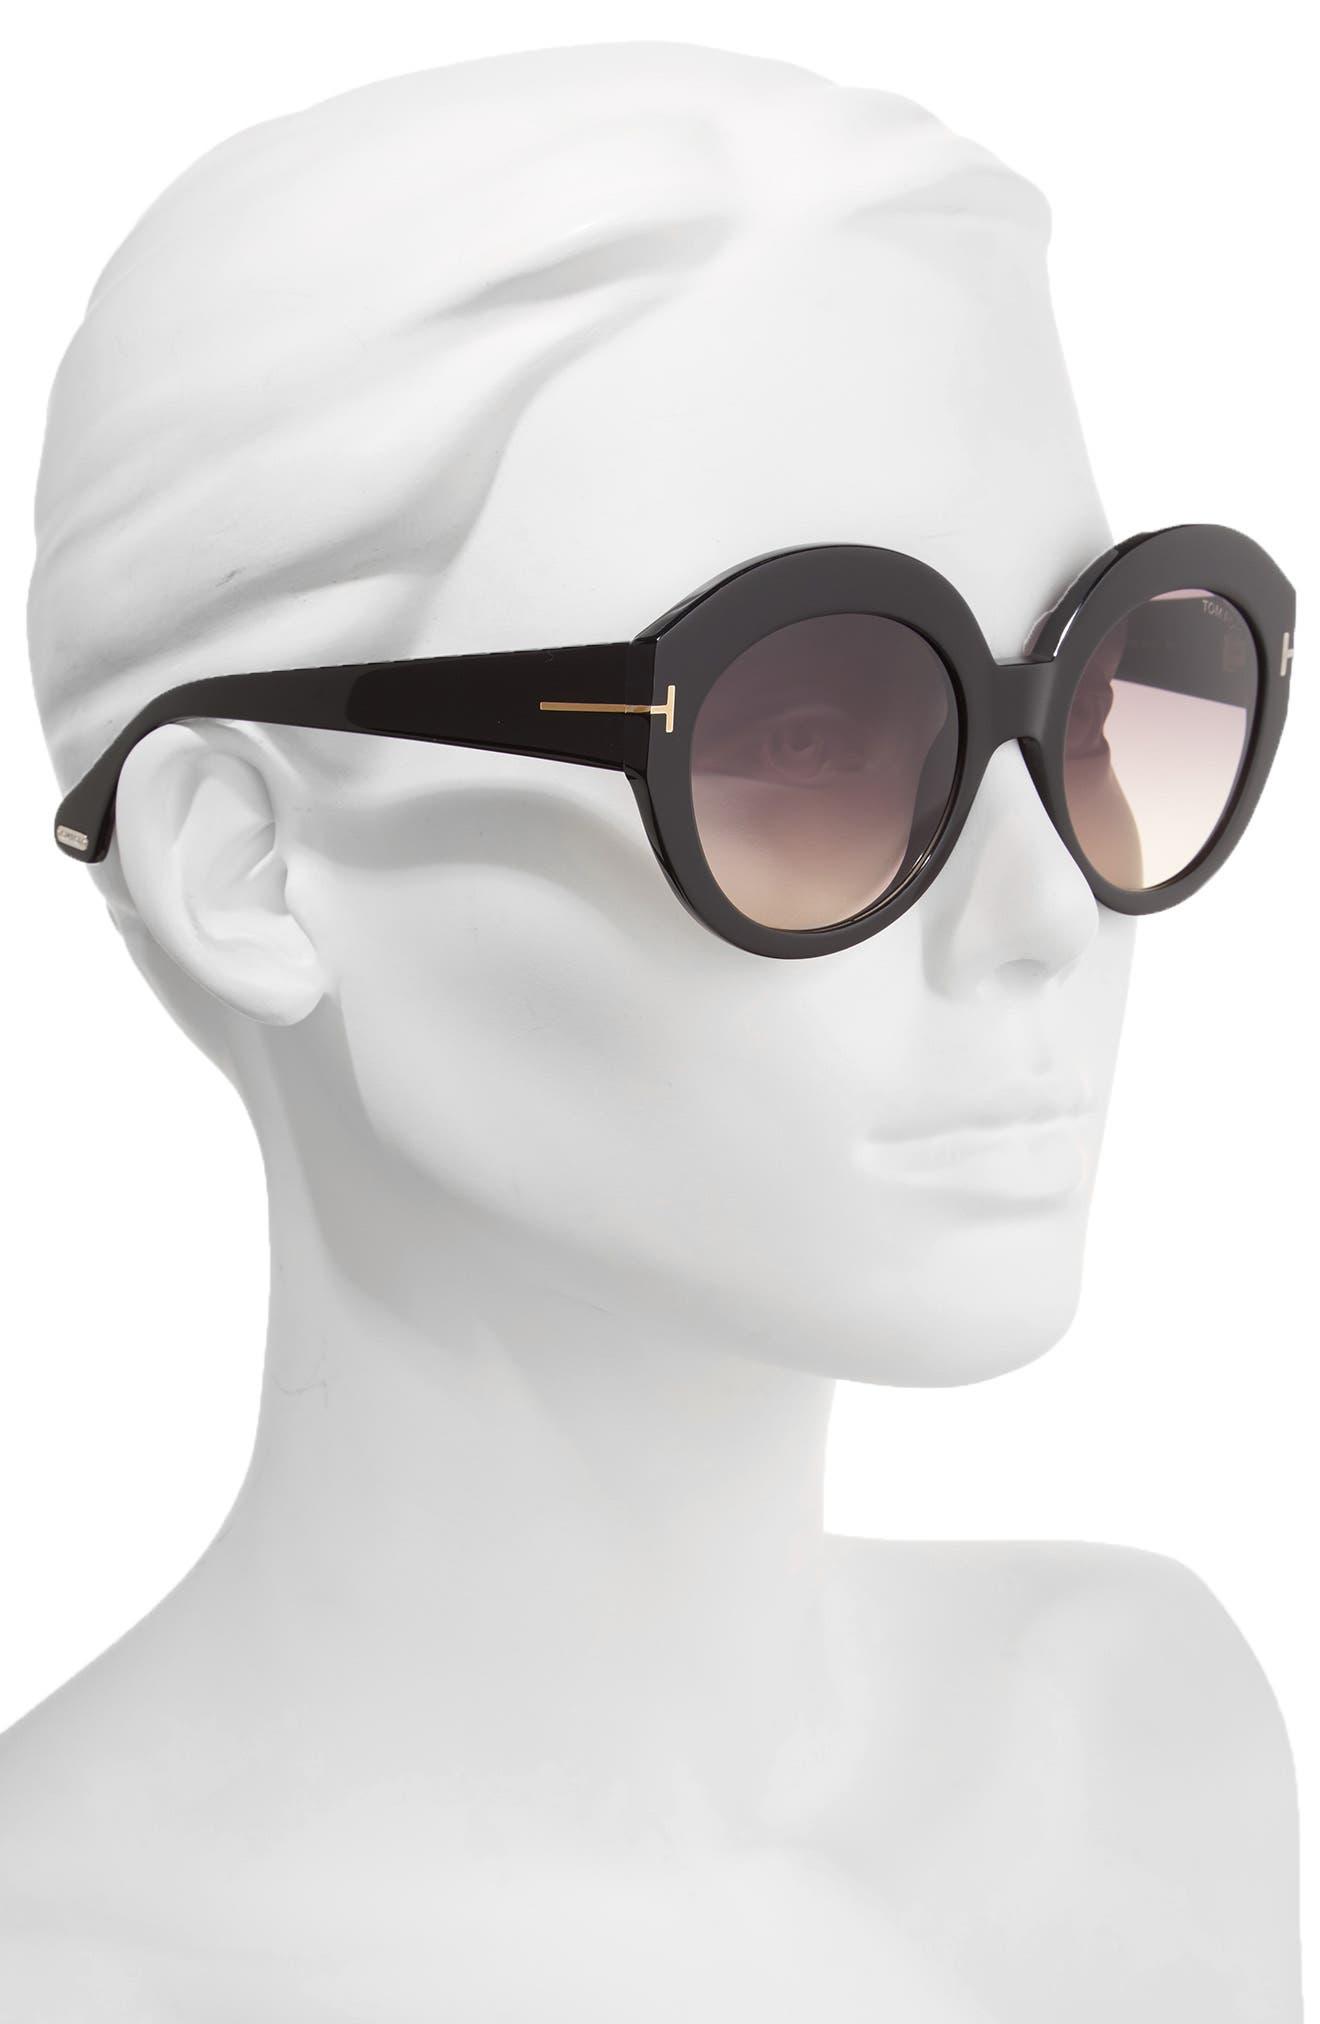 Rachel 54mm Gradient Lens Sunglasses,                             Alternate thumbnail 2, color,                             Shiny Black/ Gradient Smoke